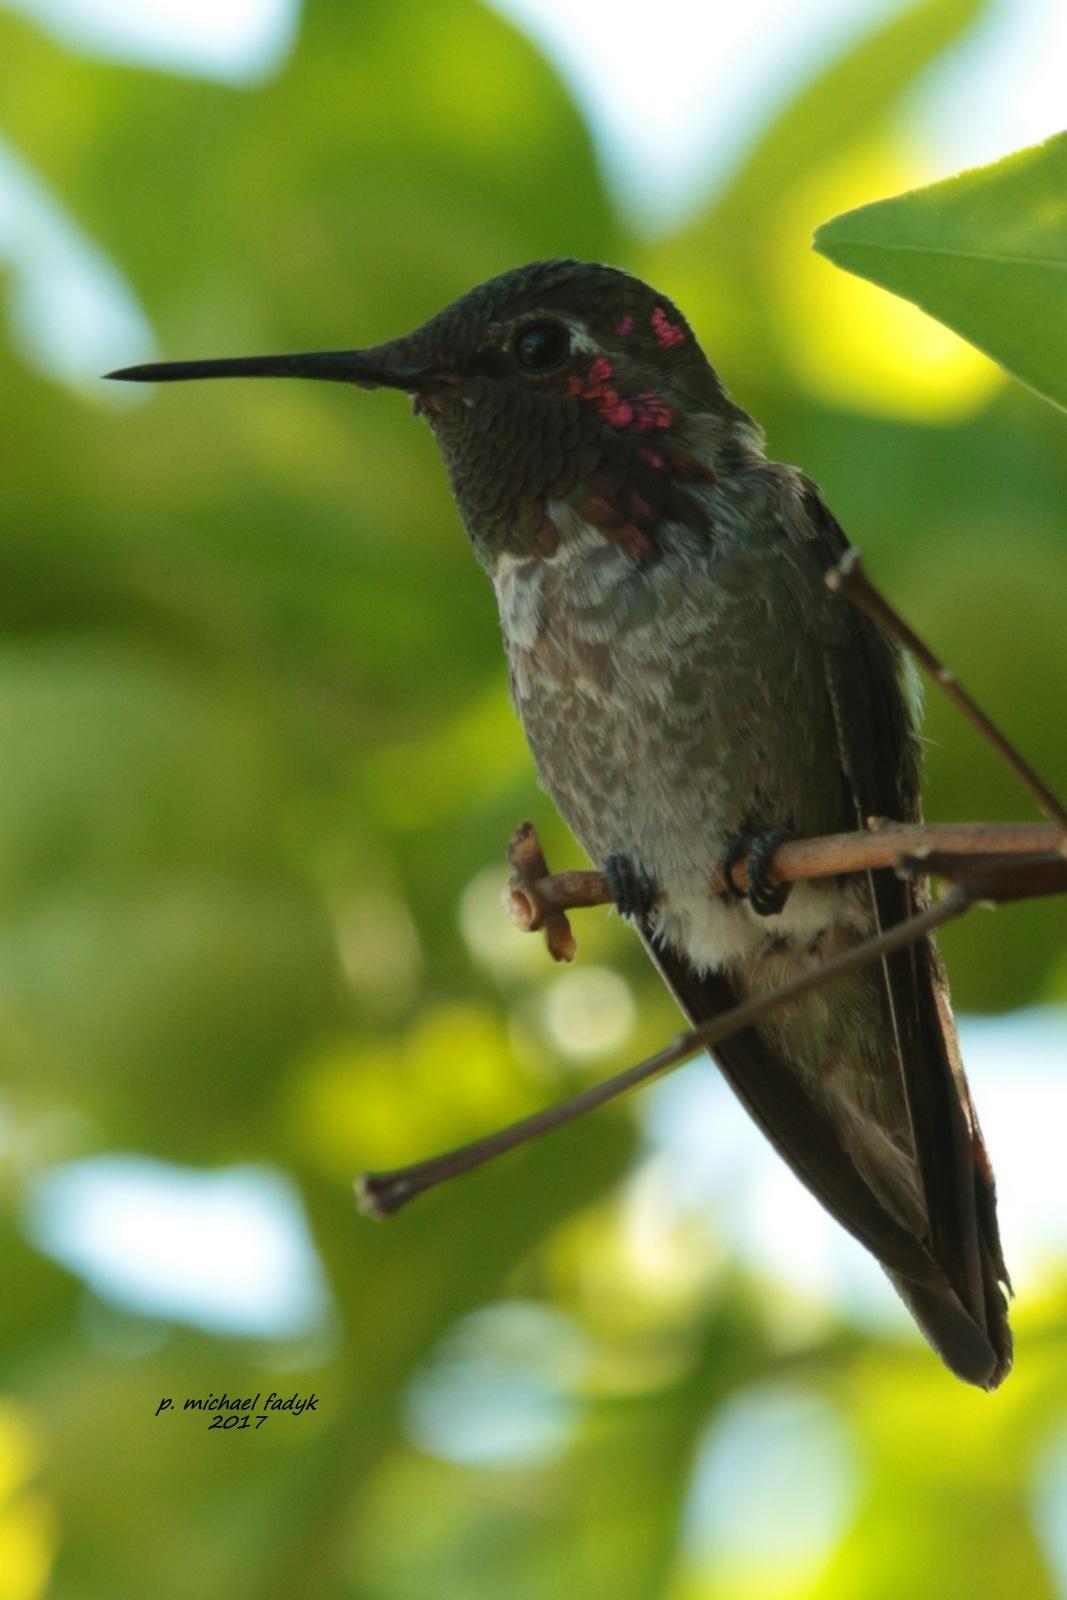 BIRD! by P. Michael Fadyk